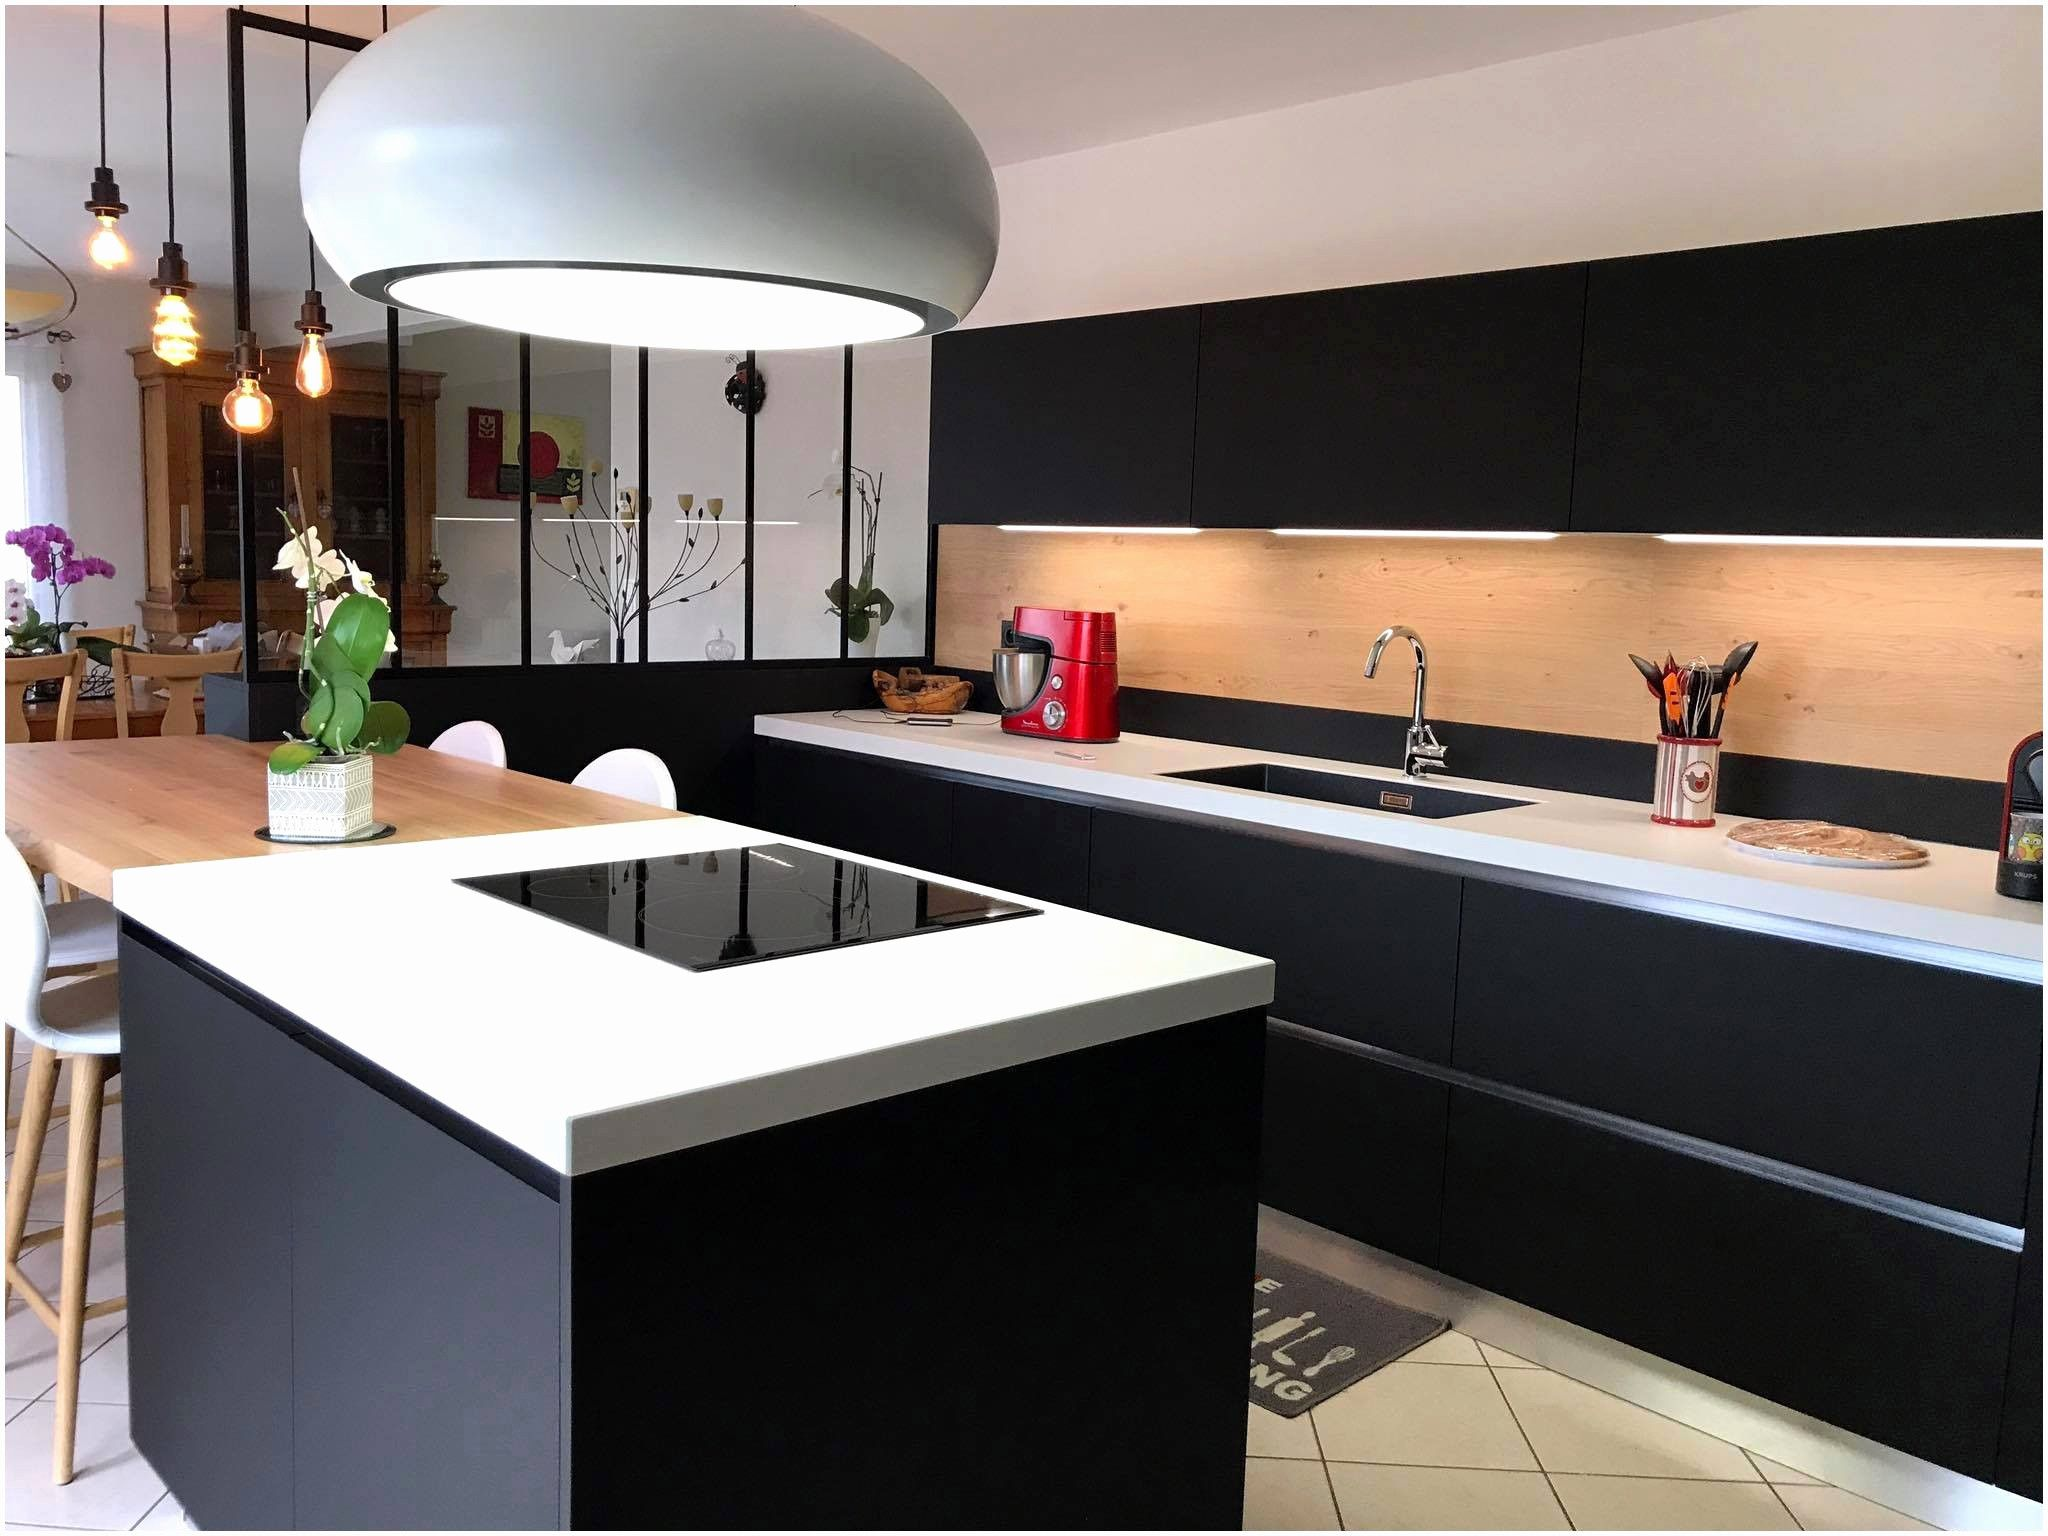 Best Of Plan Cuisine Castorama  Kitchen remodel, Furniture design